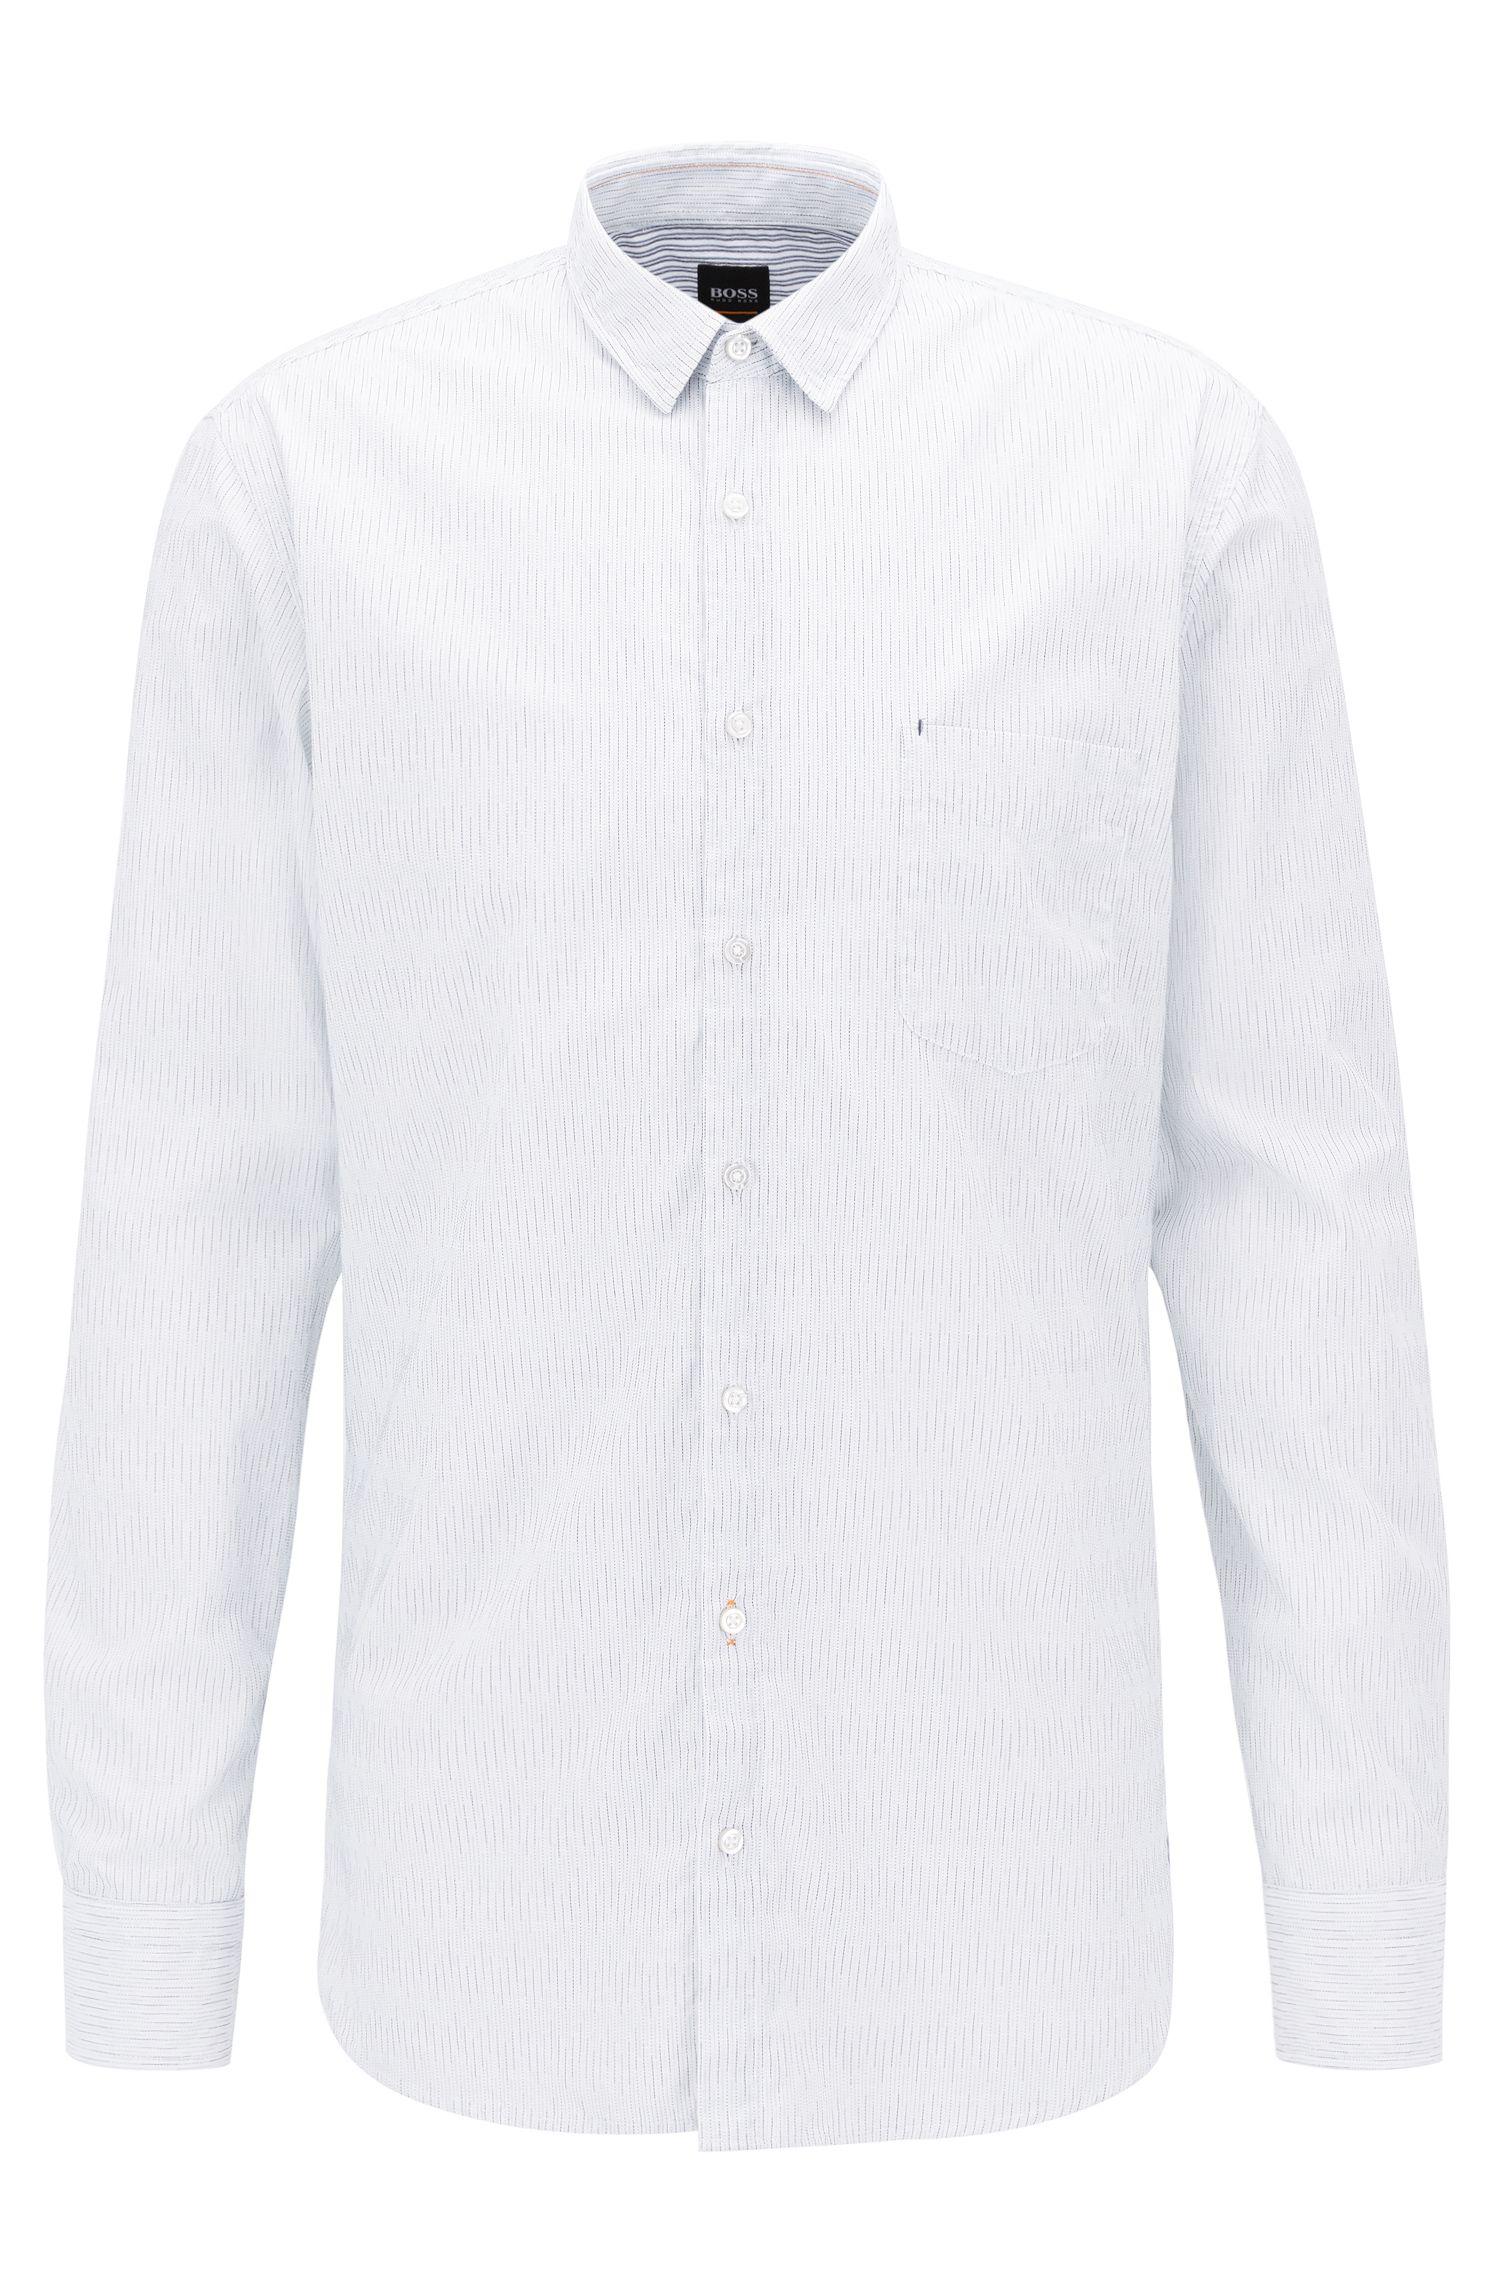 Cotton Sport Shirt, Slim Fit | Cattitude